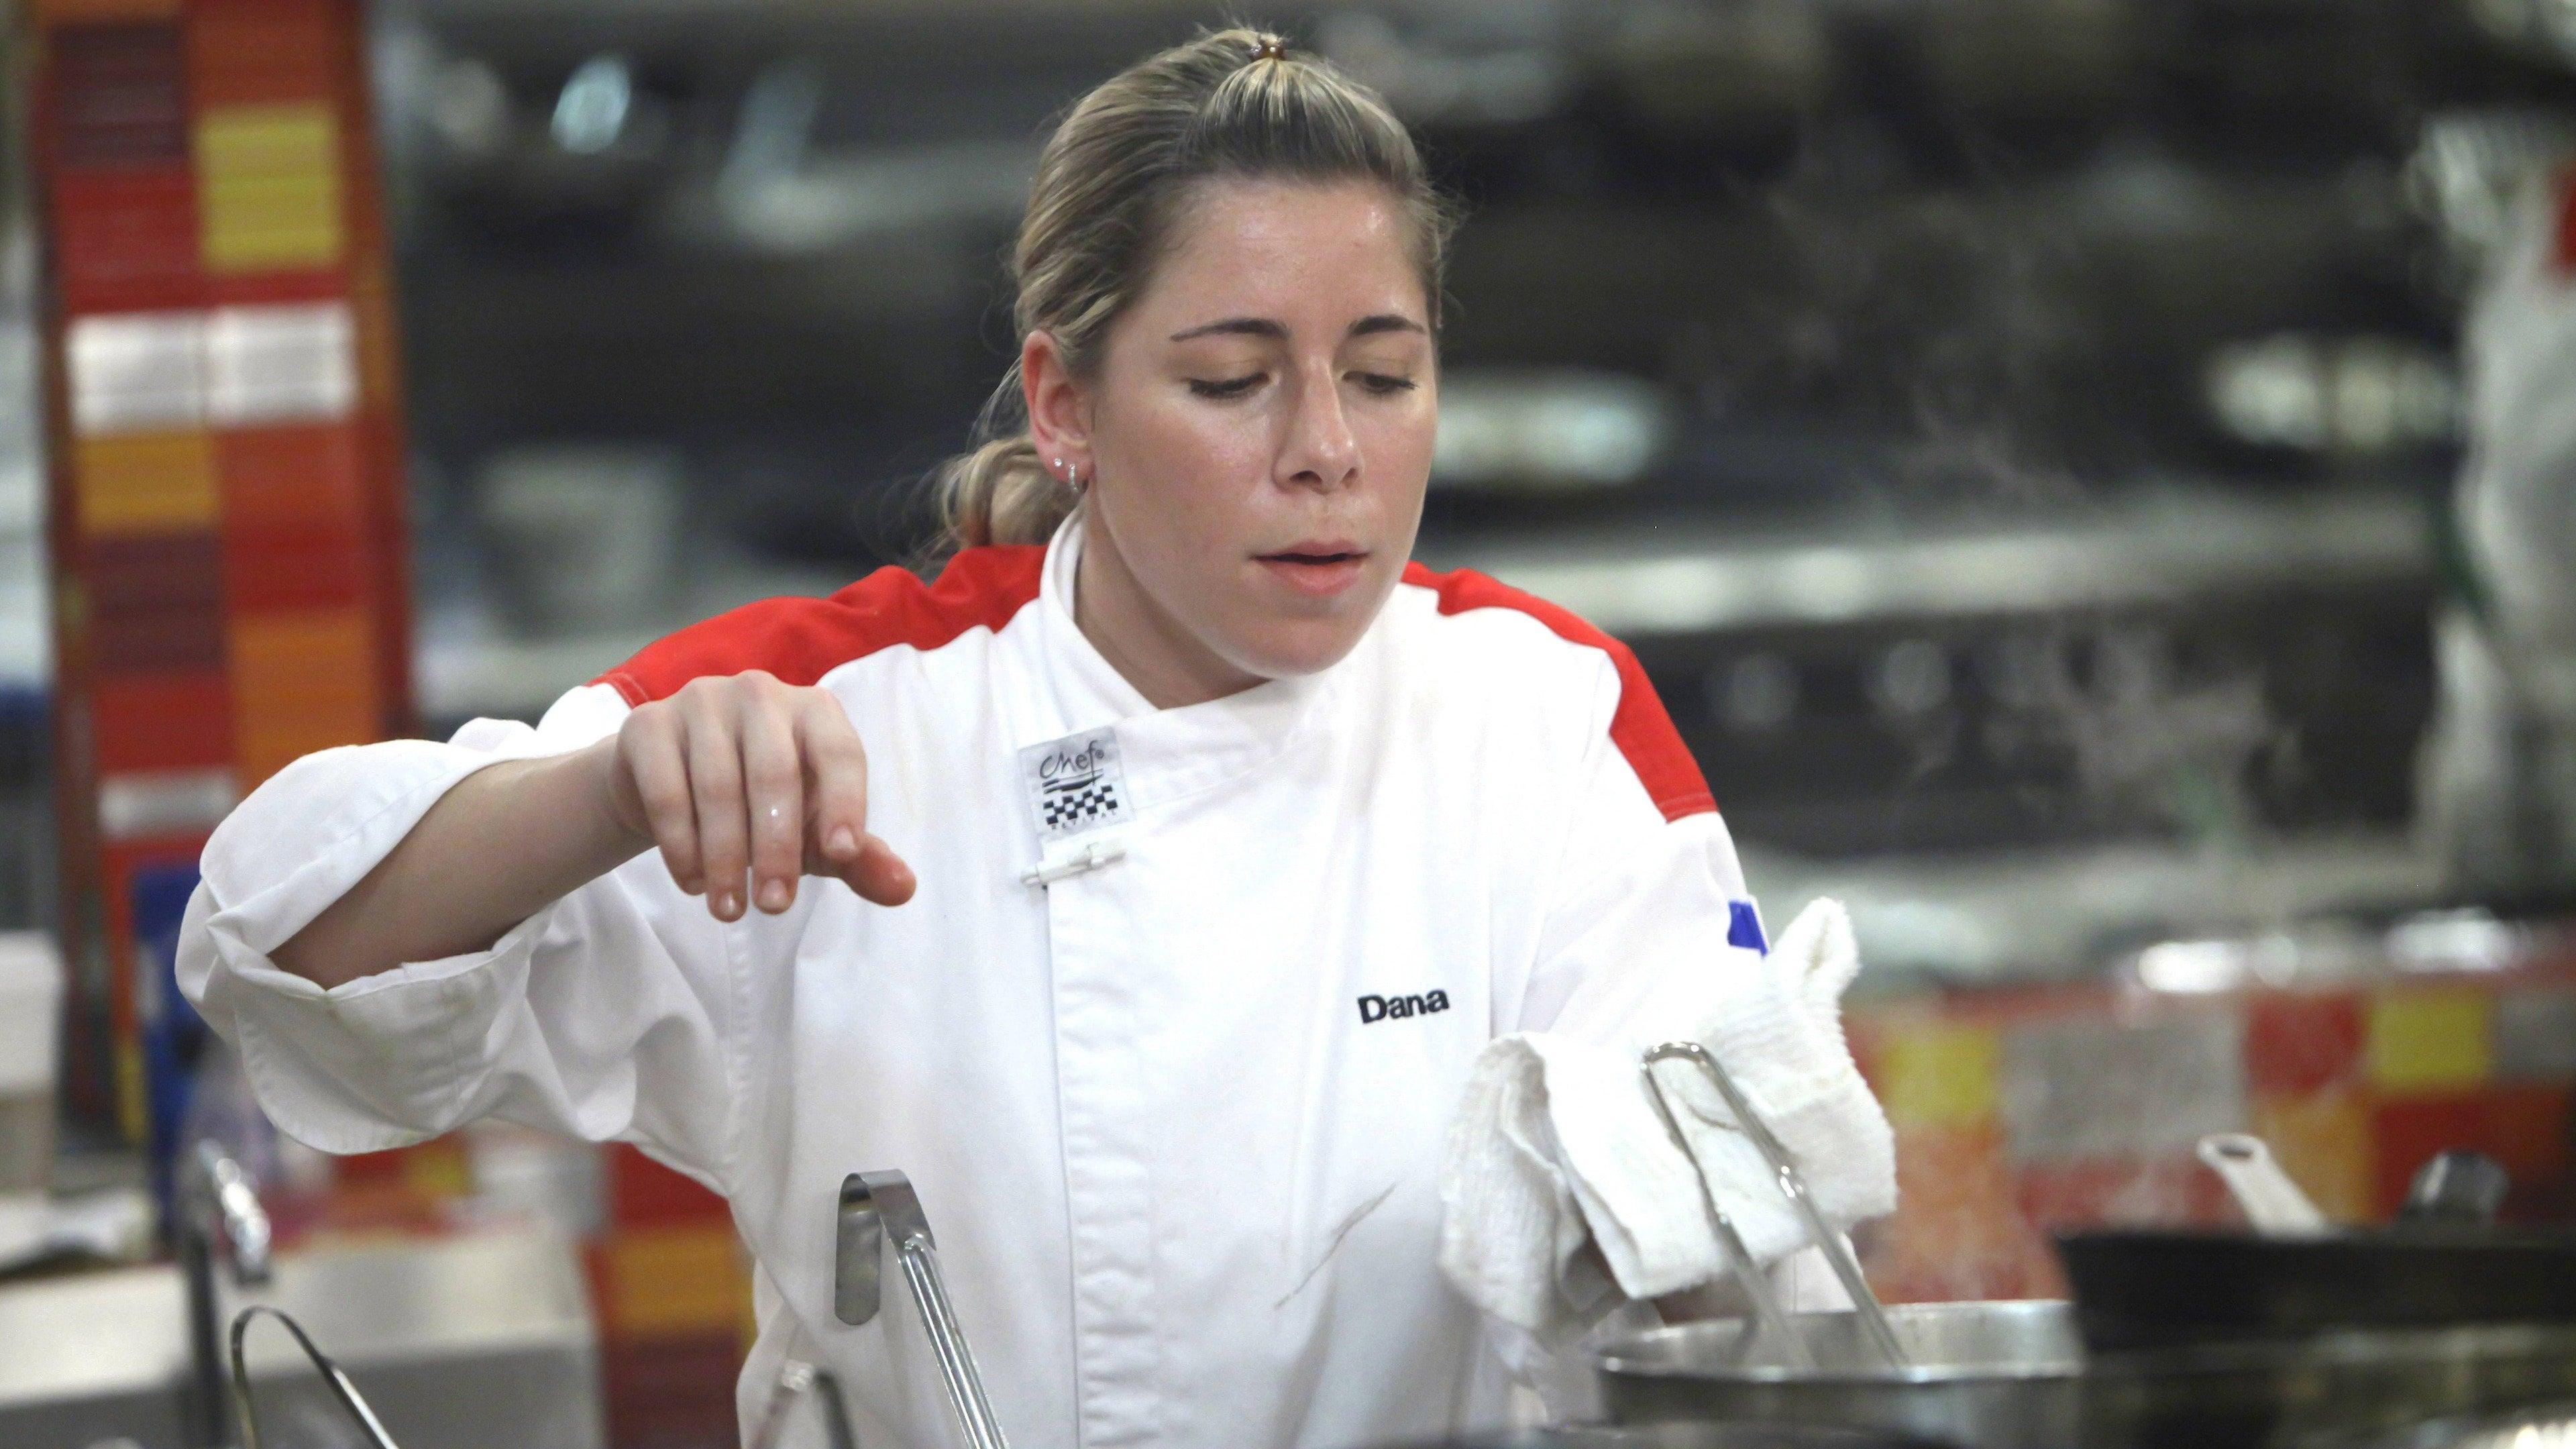 9 Chefs Compete, Part 1